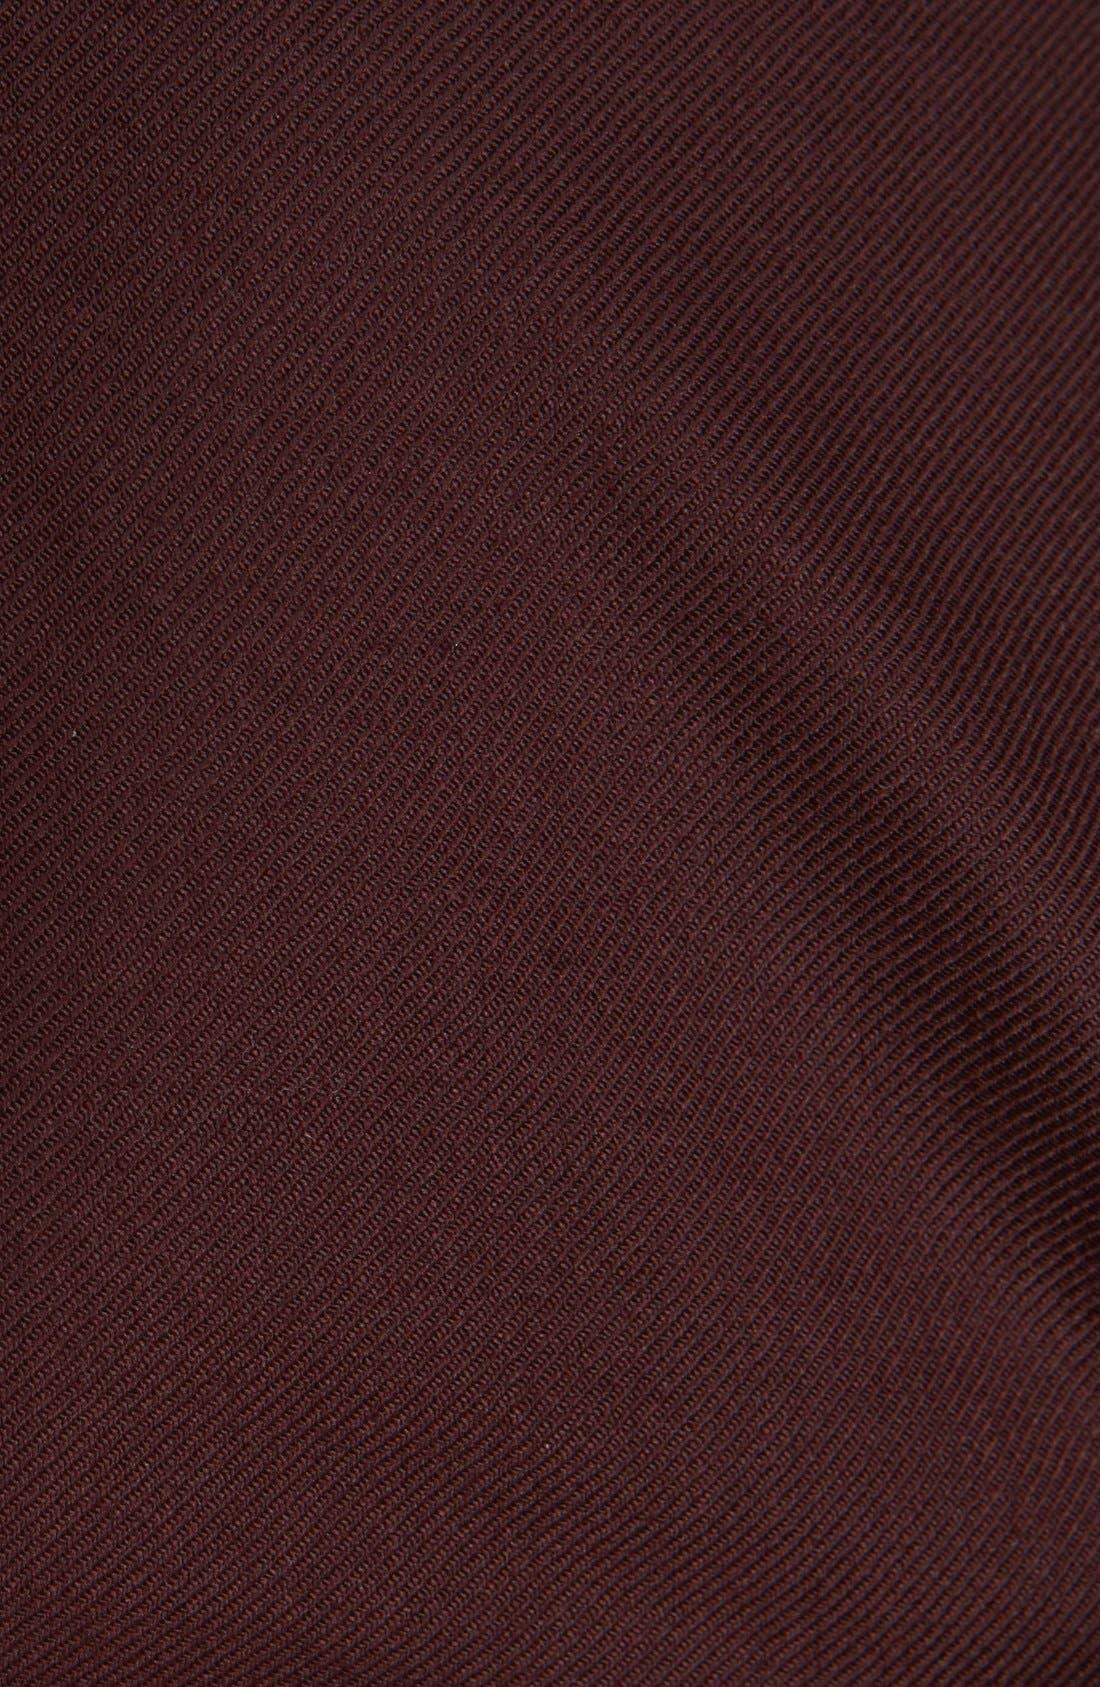 Alternate Image 3  - Vetements 'Schoolgirl' Lace Trim Minidress